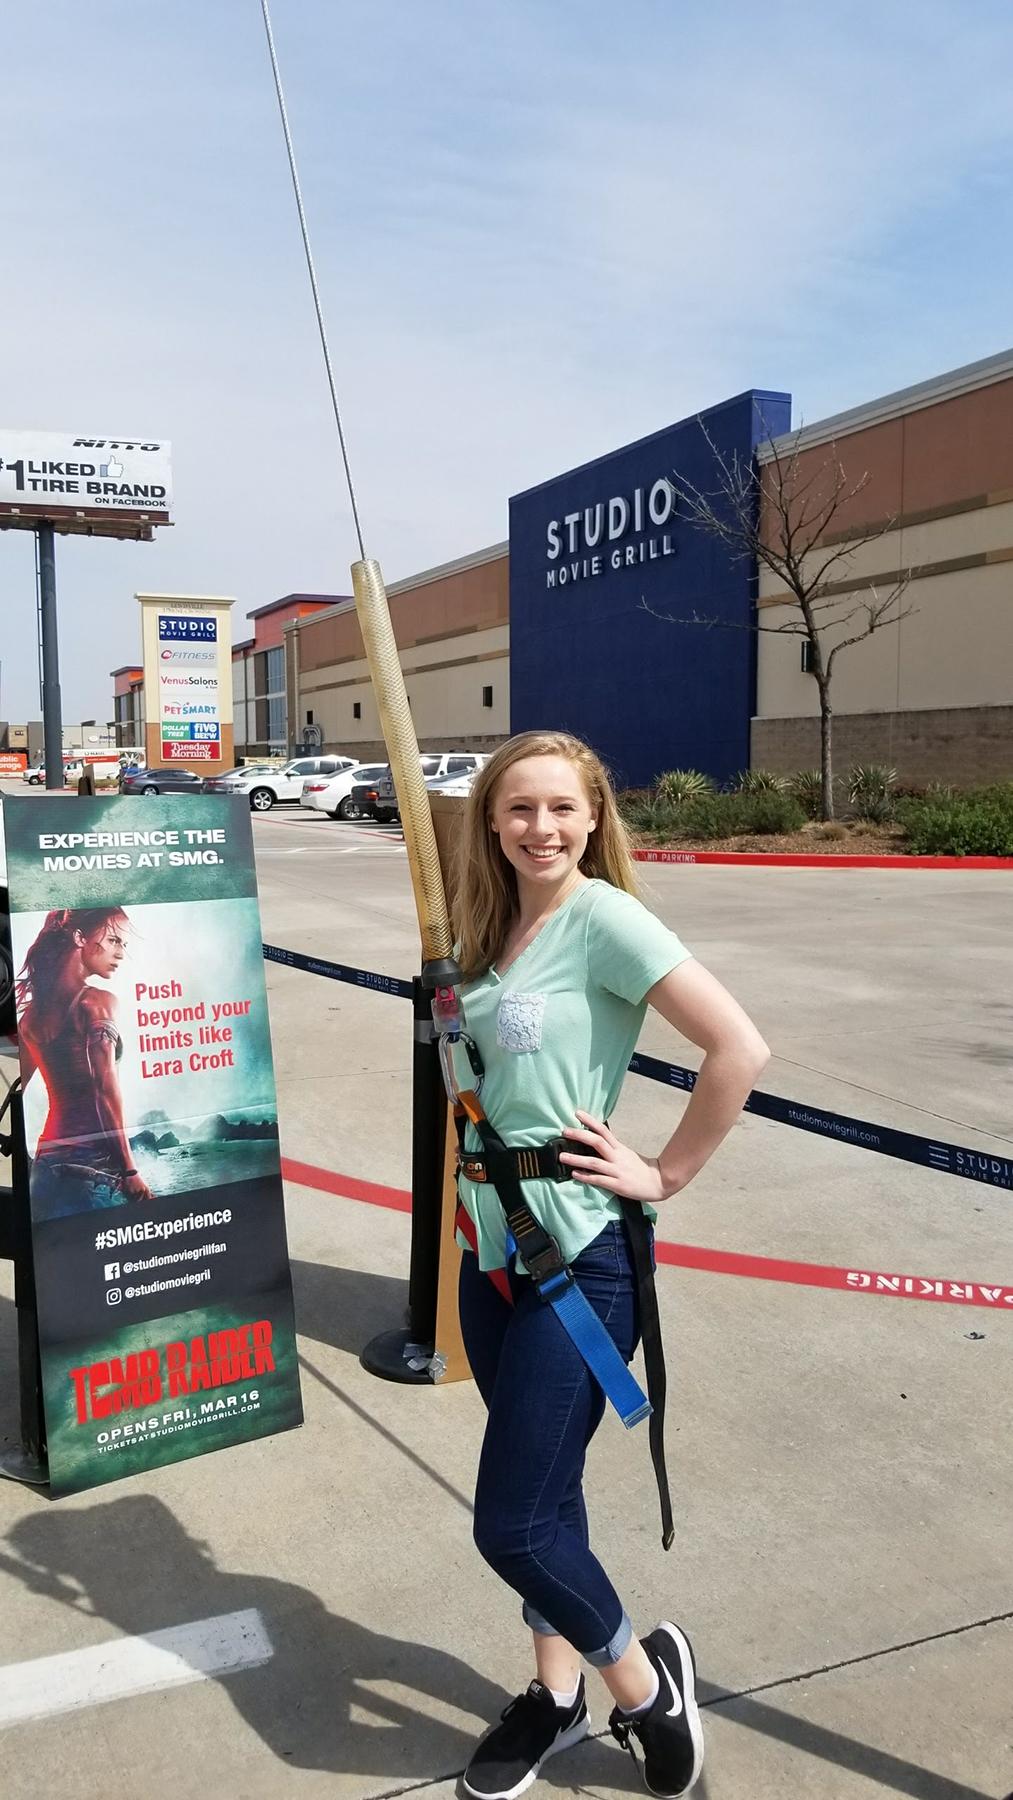 Beyond the Film Tomb Raider Event